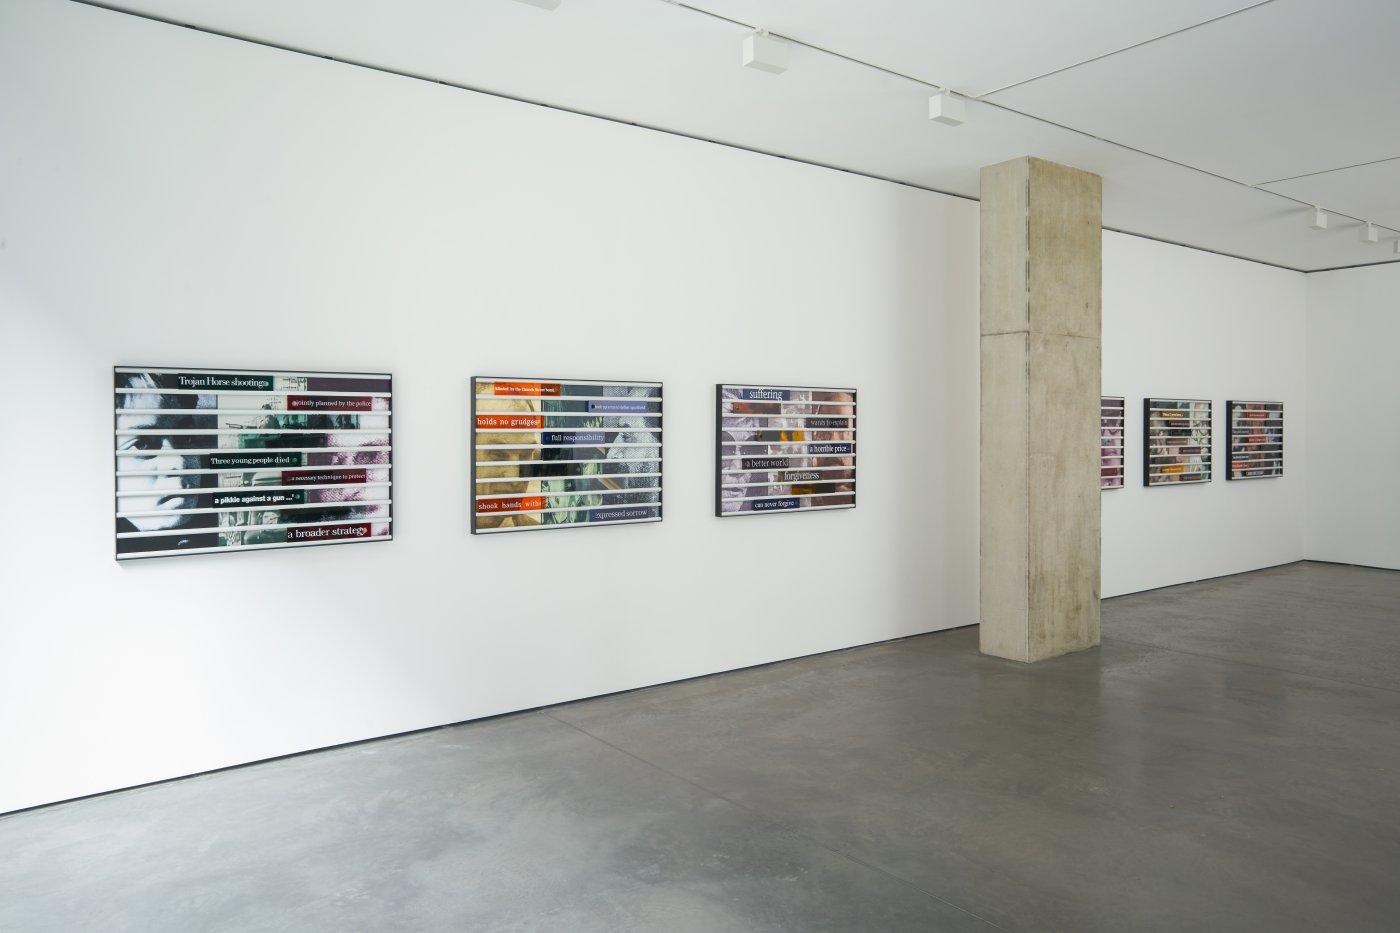 Goodman Gallery Sue Williamson 2